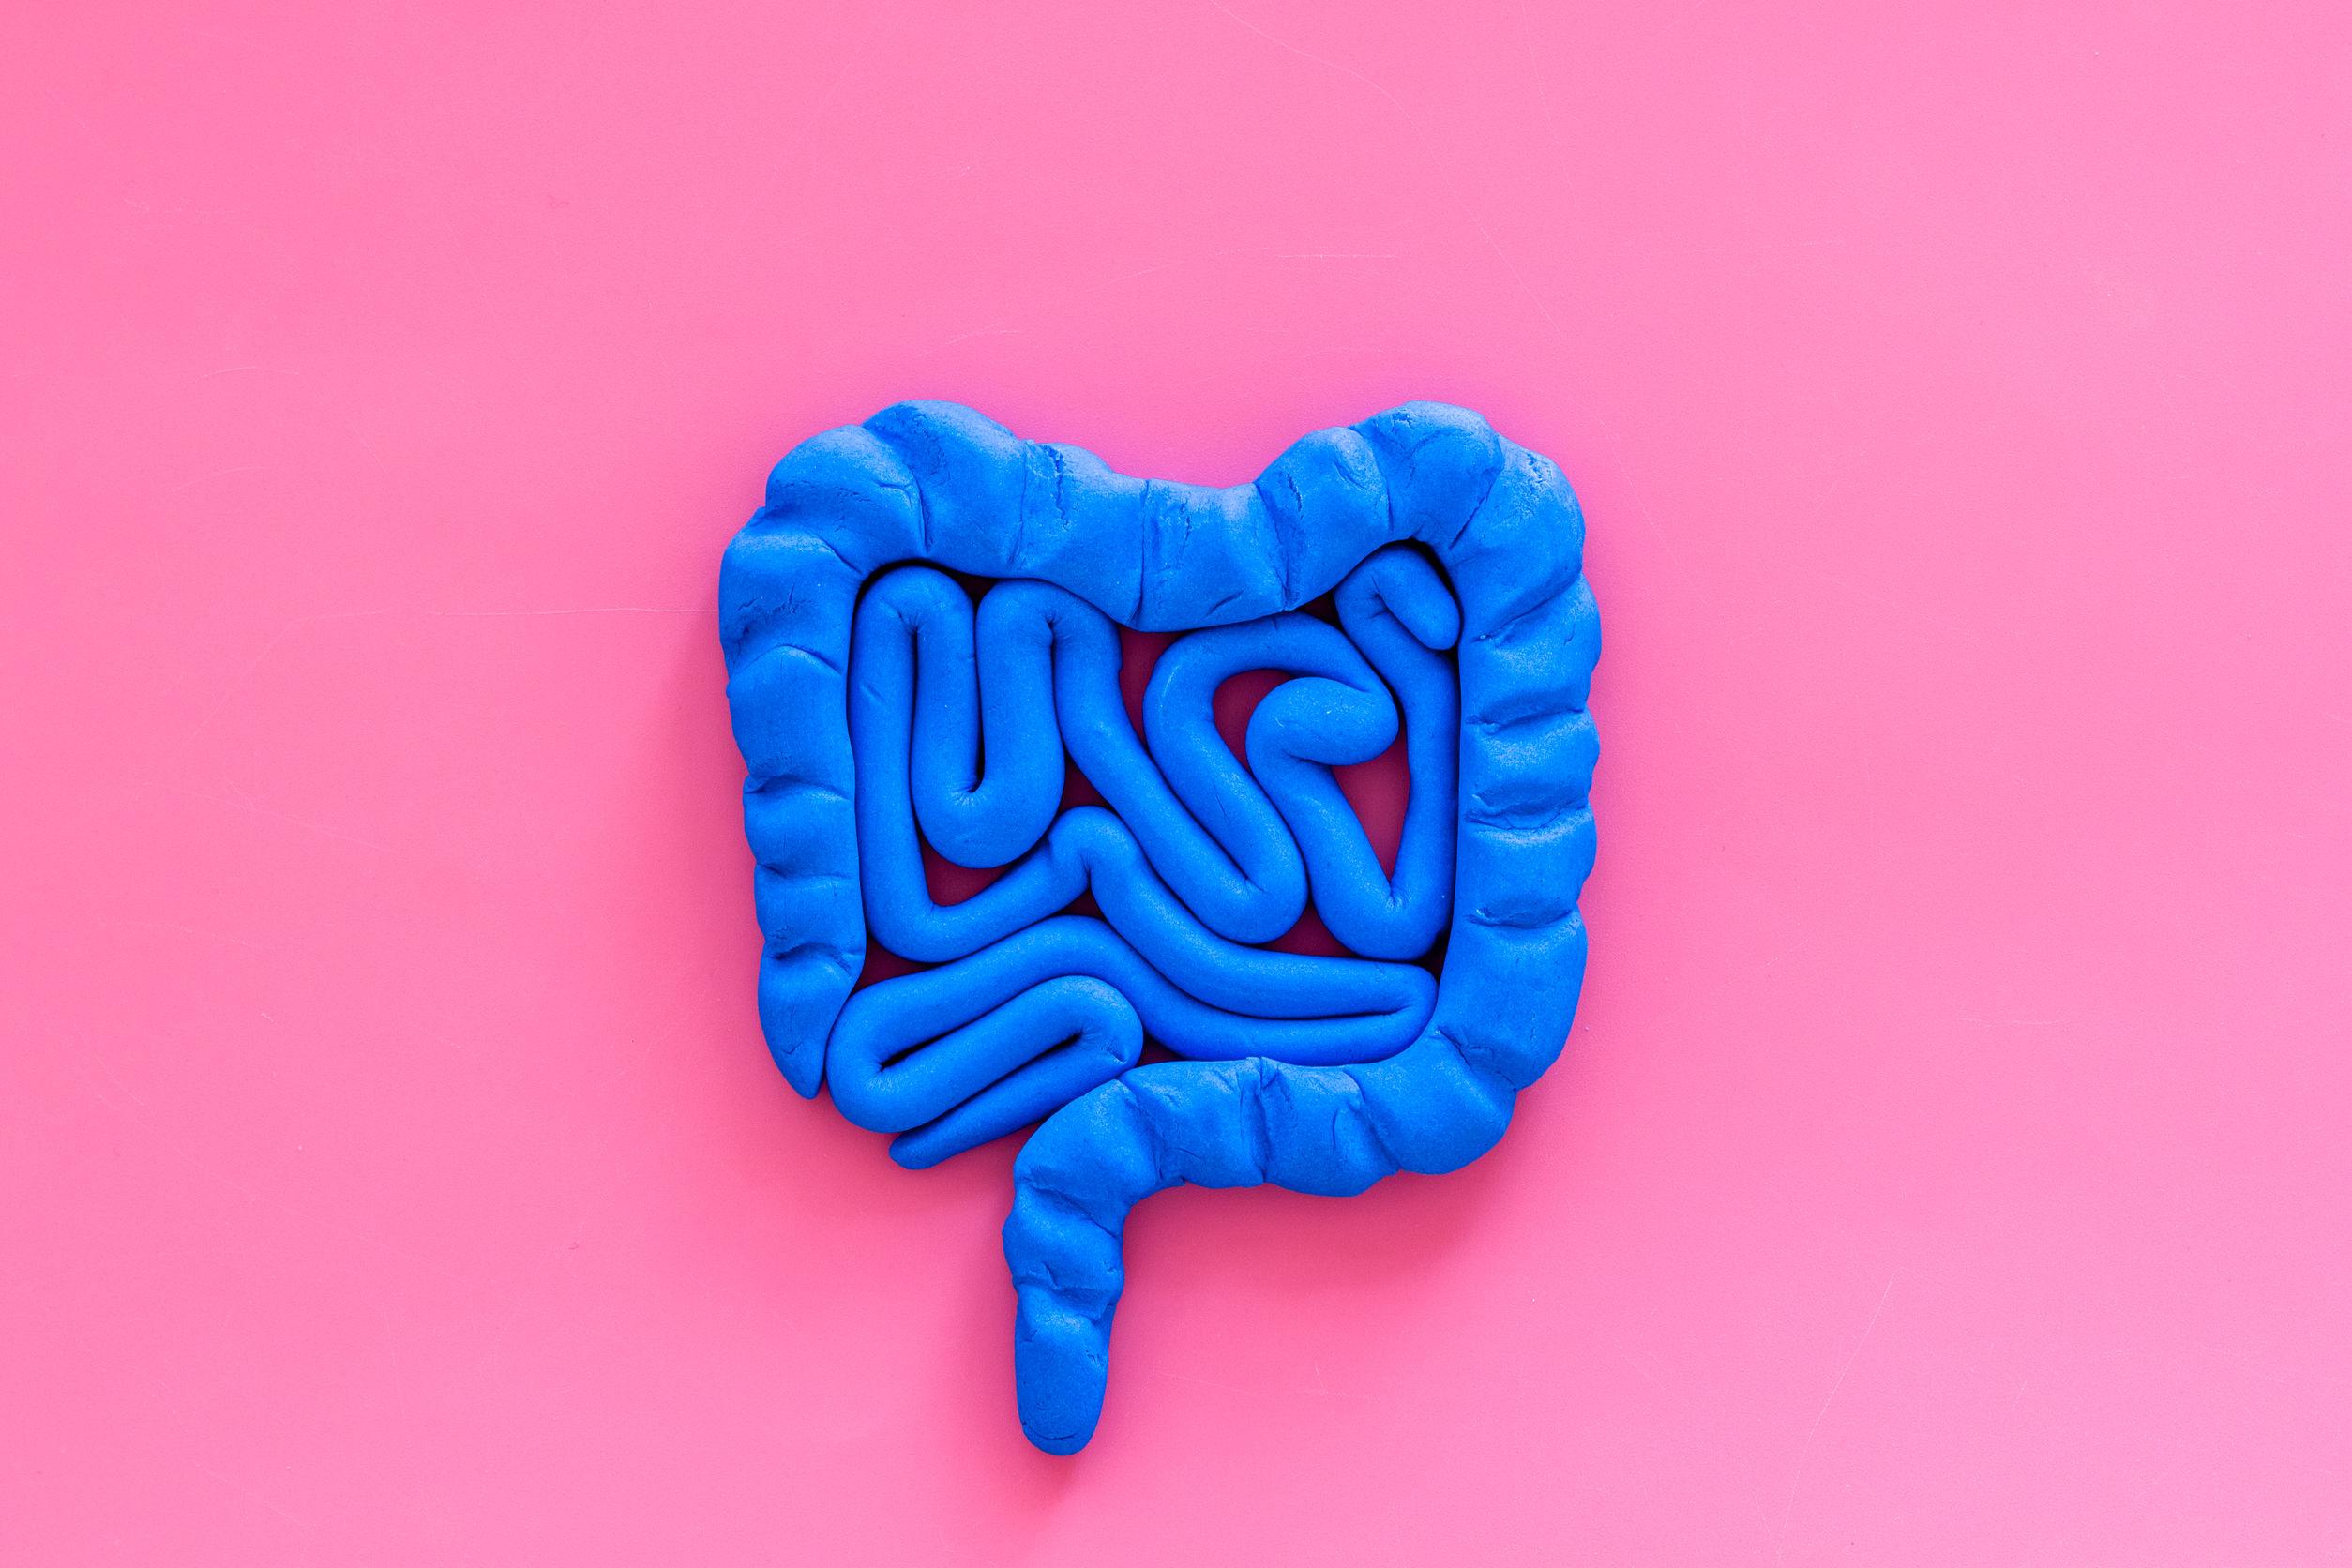 Intestino blu